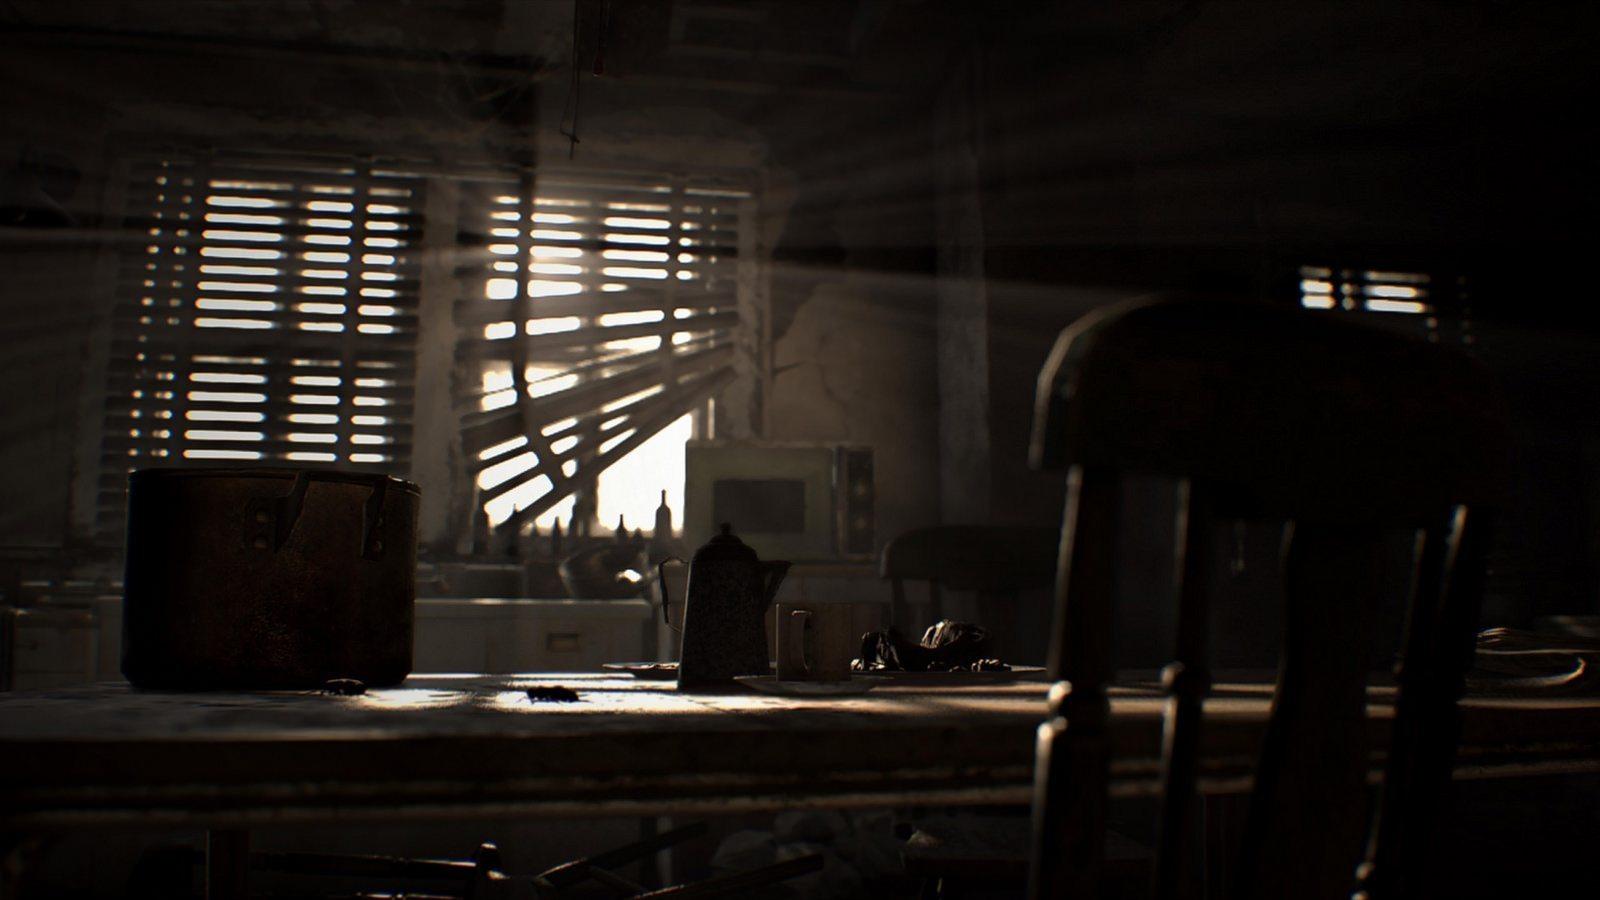 Resident Evil VII: biohazard window